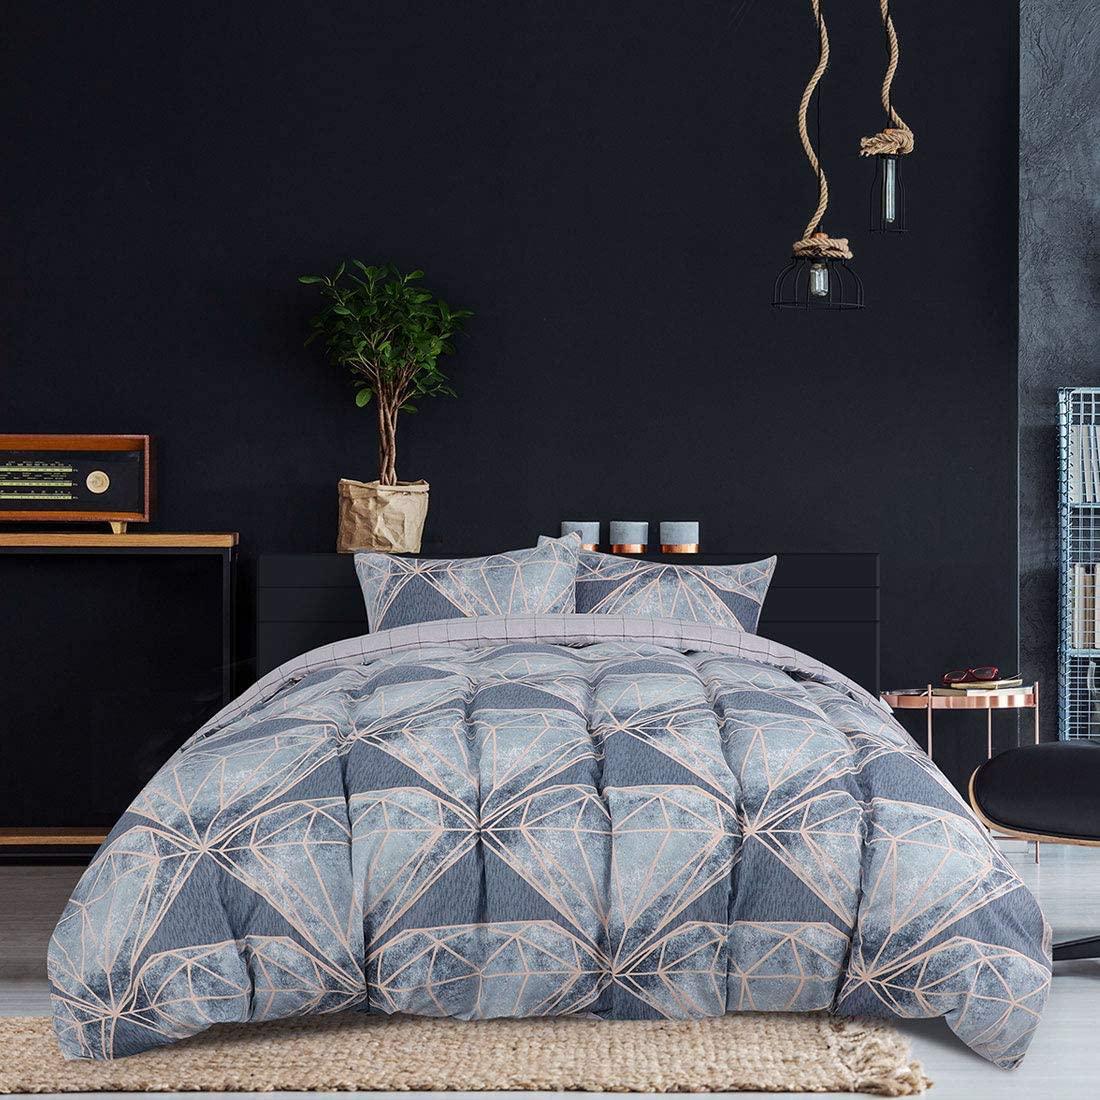 PiccoCasa Twin Duvet Cover Set, Soft Geometric Diamond Pattern Lightweight Microfiber Bedding Cover Modern Style Comforter Quilt Cover Set(No Duvet with Hidden Zip and Corner Ties (Twin)